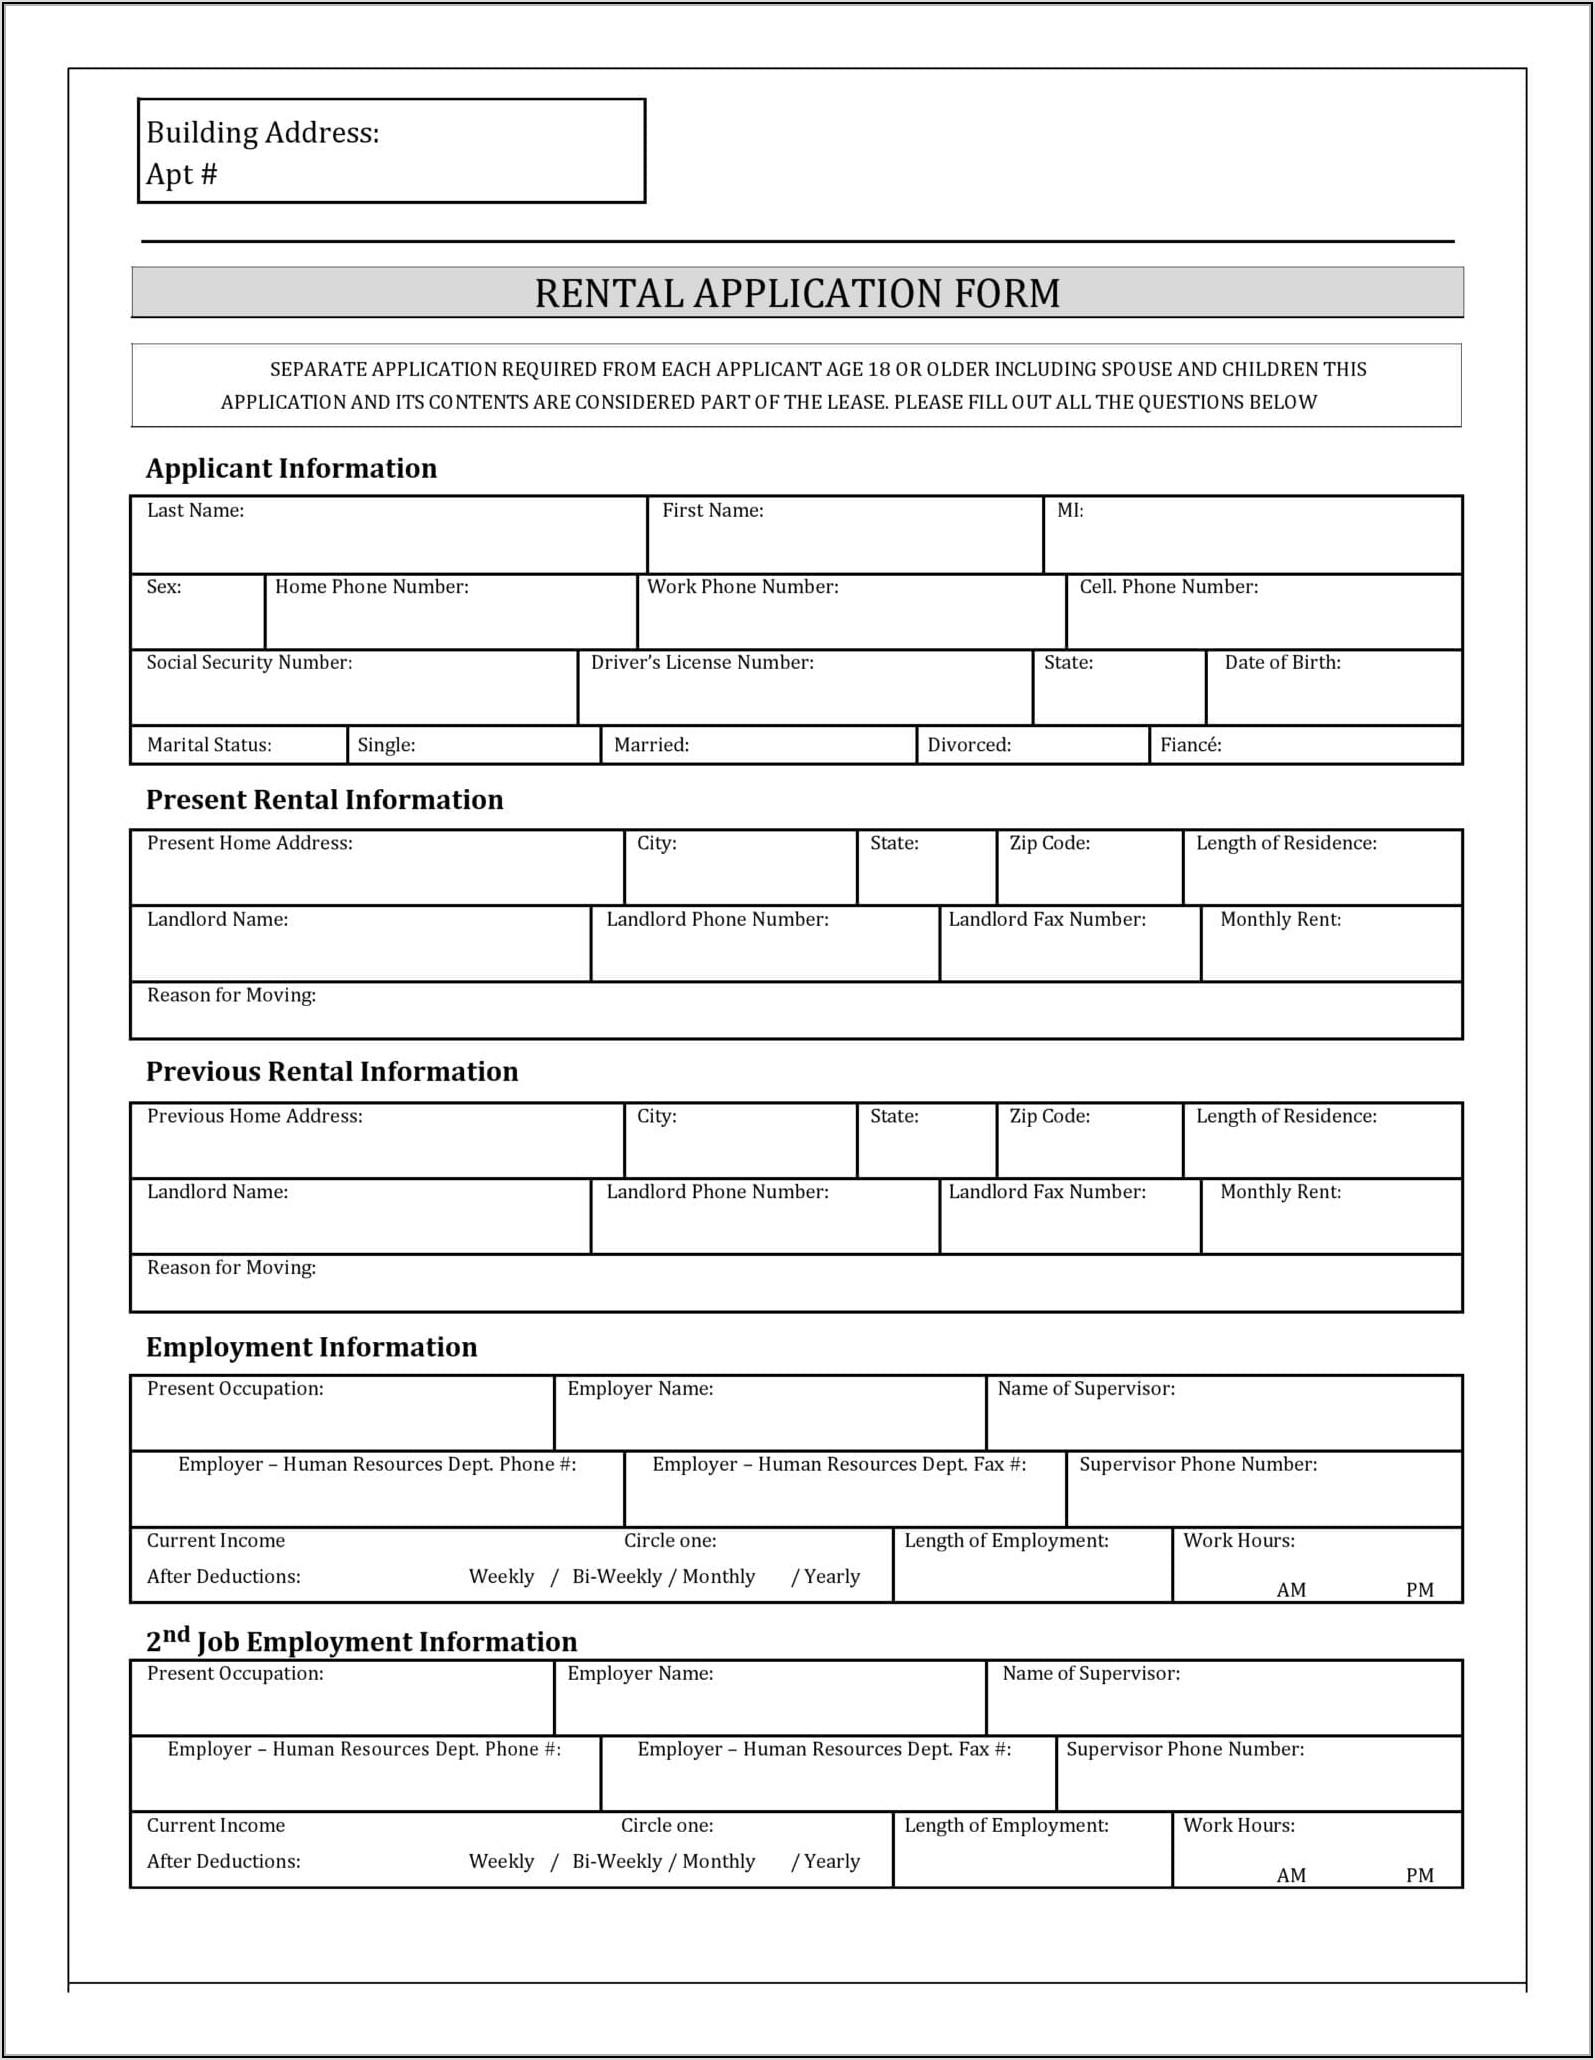 Rental Application Form Free Pdf